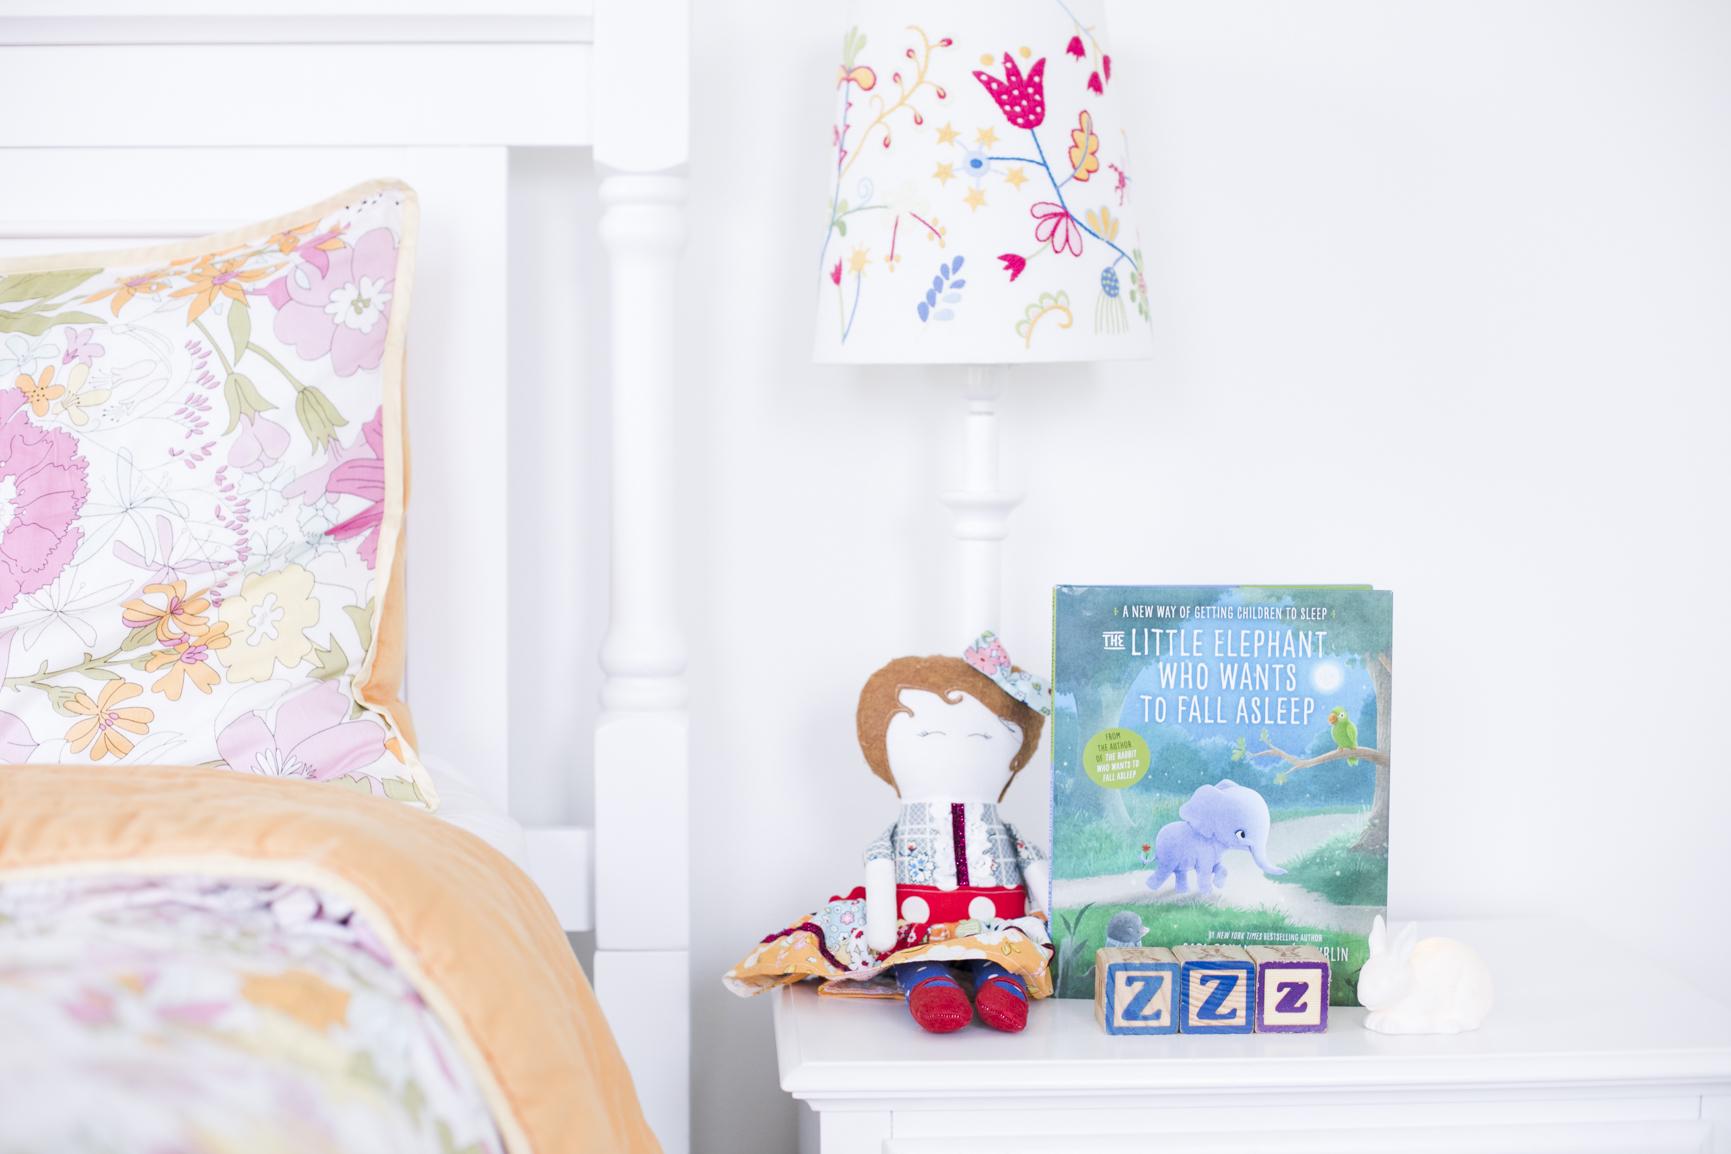 The Little Elephant who wants to sleep Book by Carl Johan